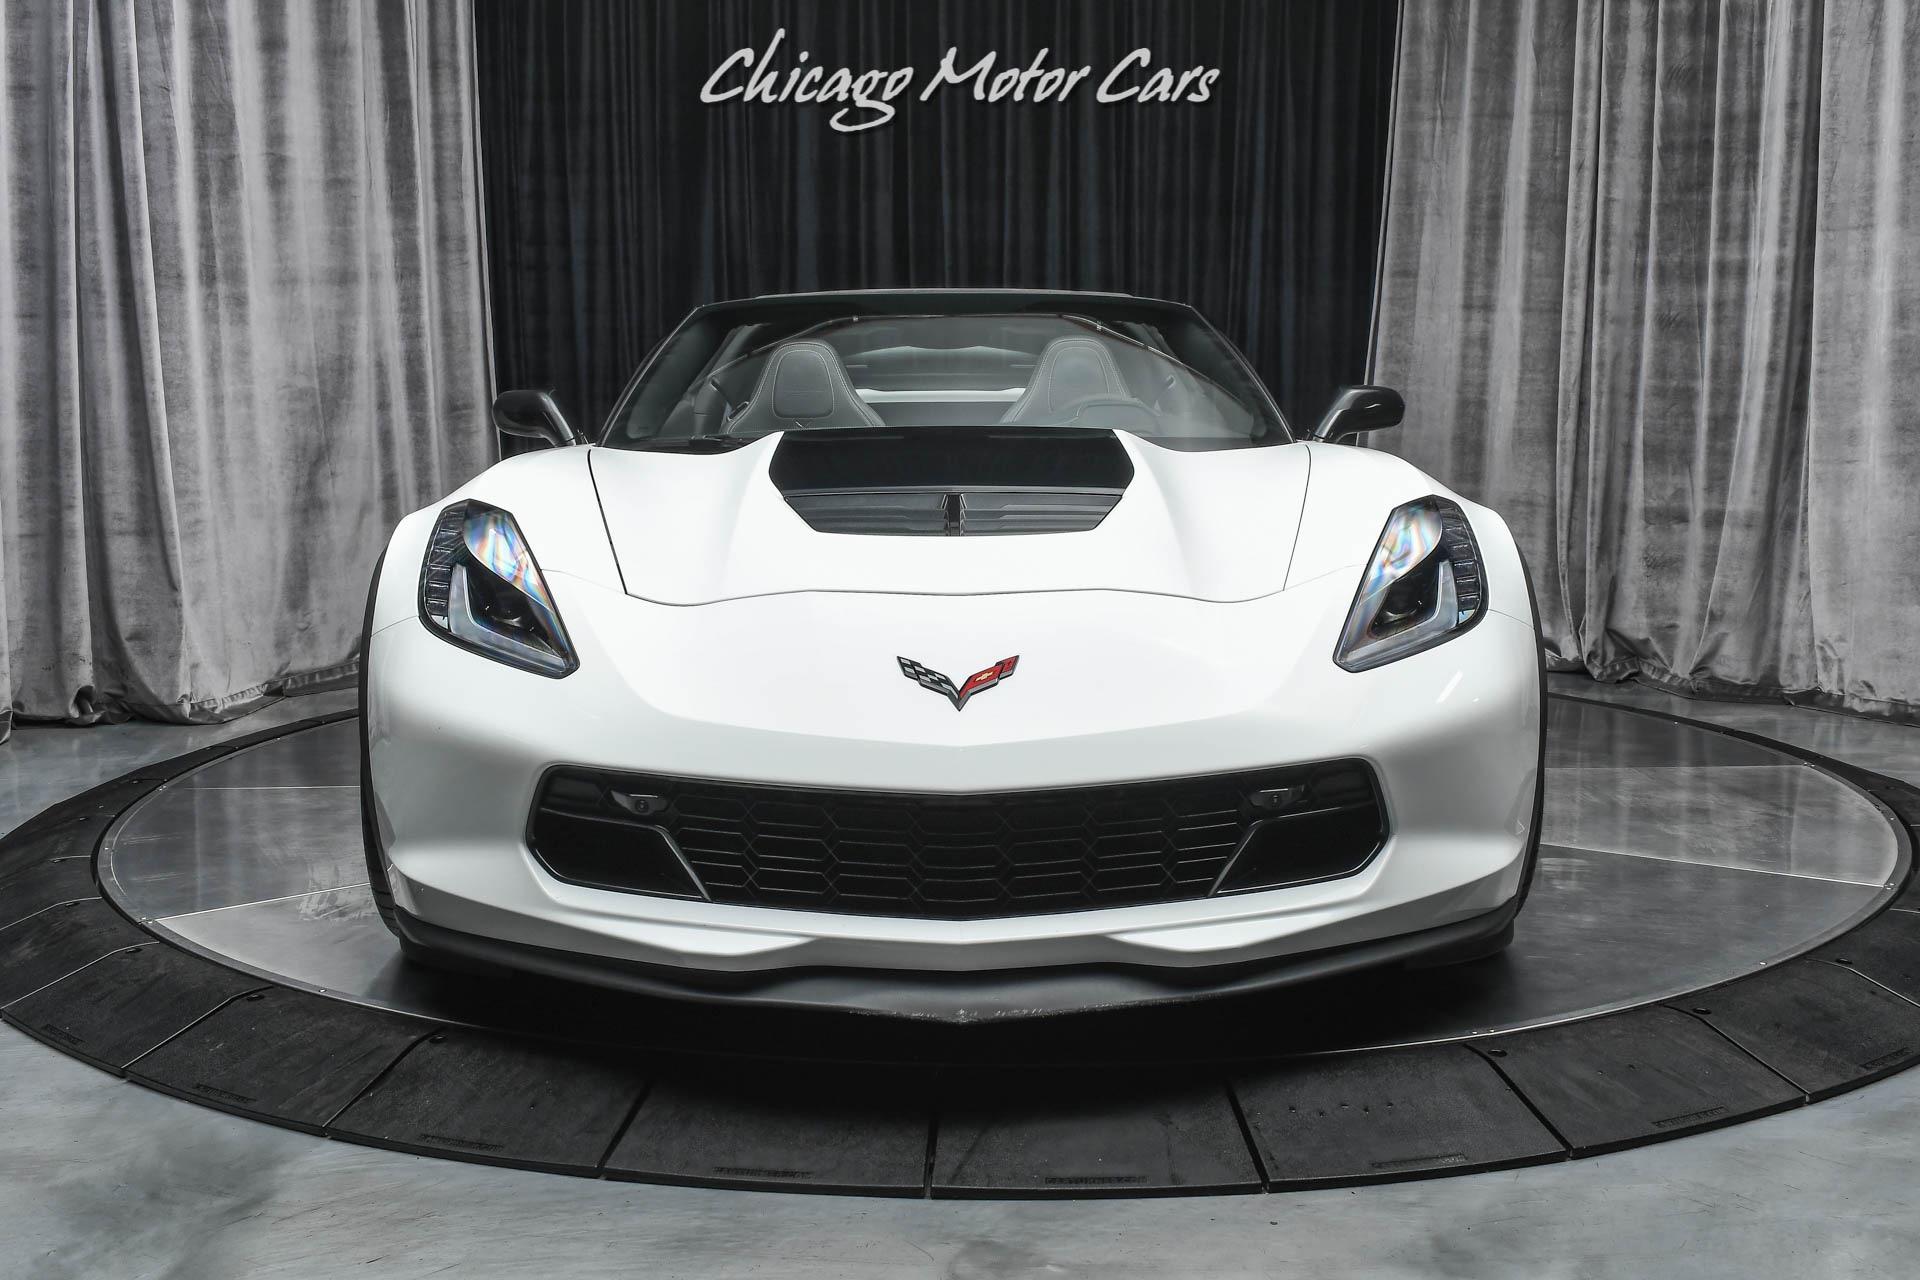 Used-2017-Chevrolet-Corvette-Z06-Low-Miles-8-Speed-Automatic-Carbon-Fiber